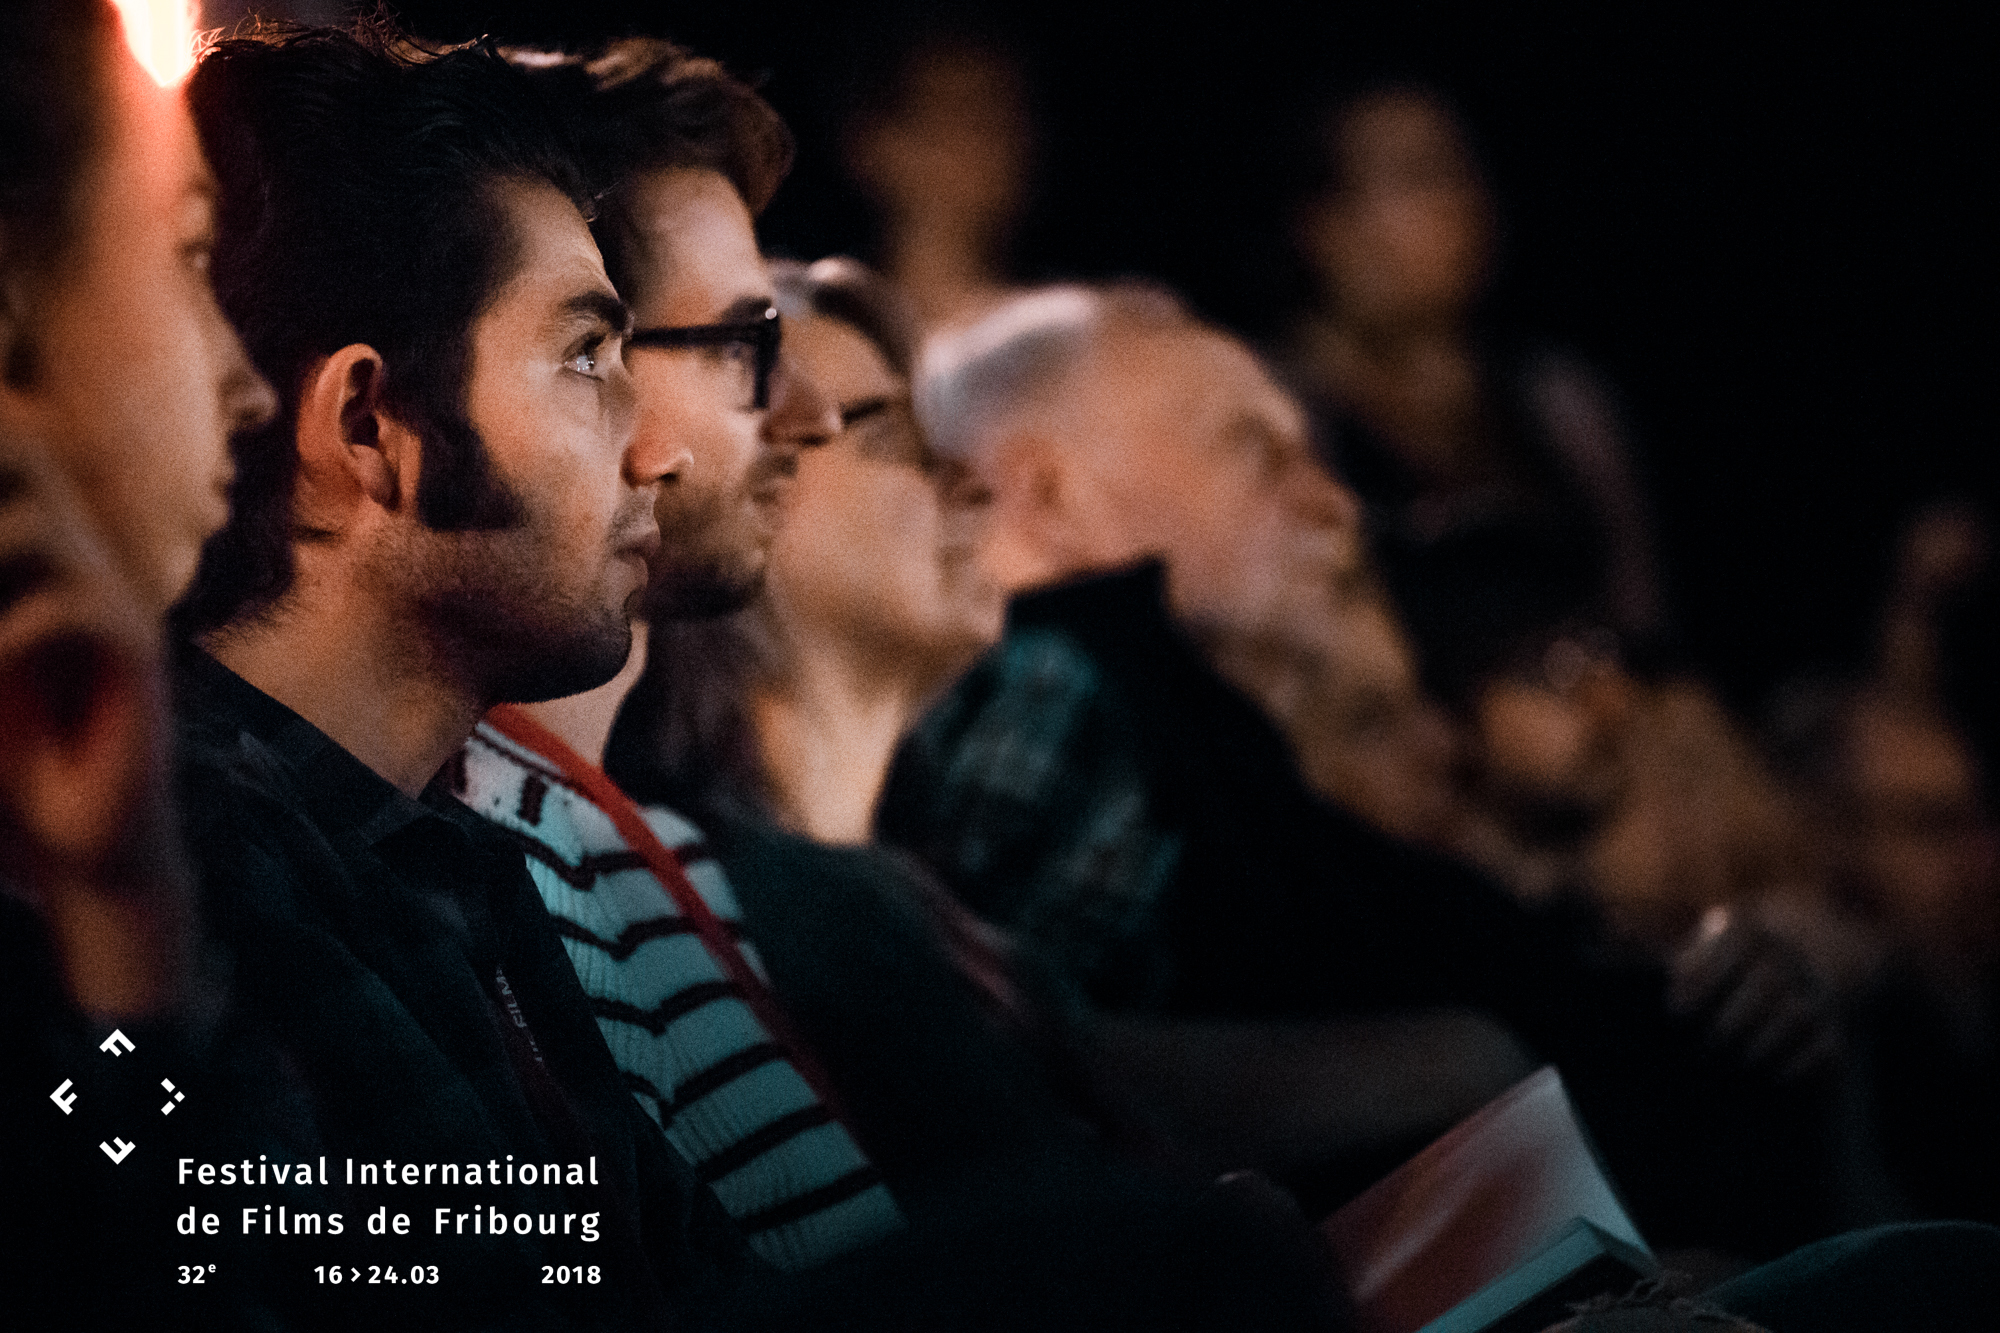 The Fribourg International Film Festival